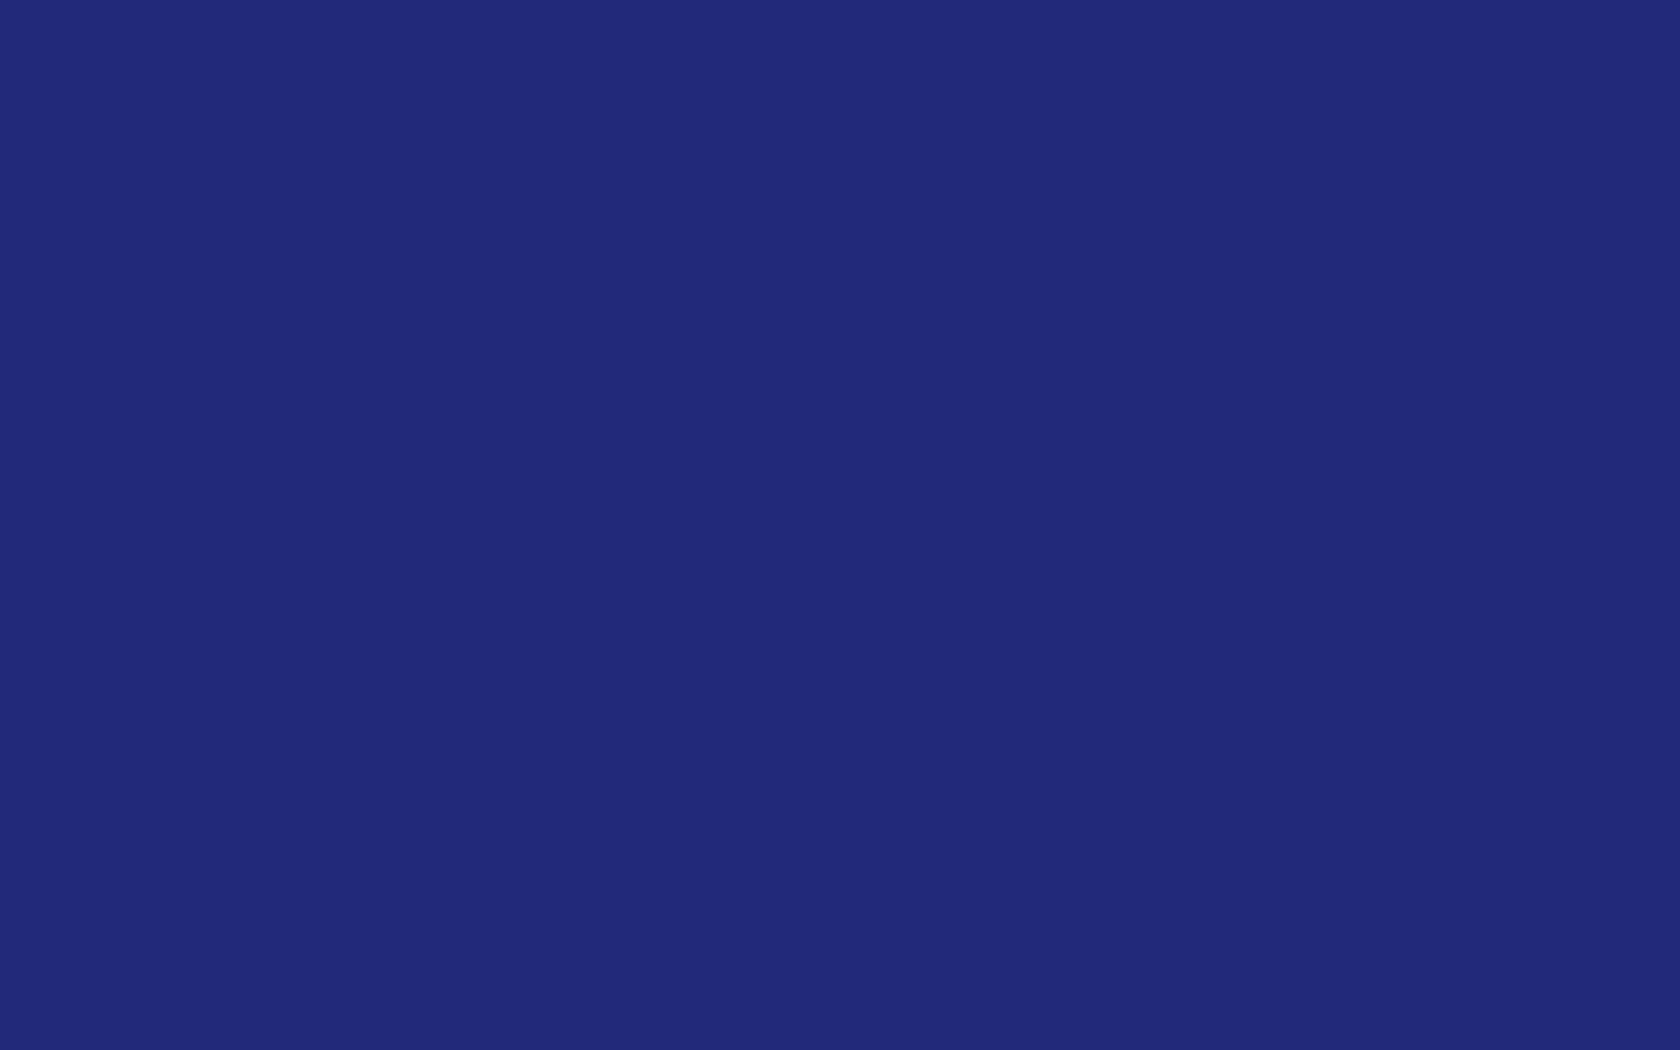 1680x1050 St Patricks Blue Solid Color Background